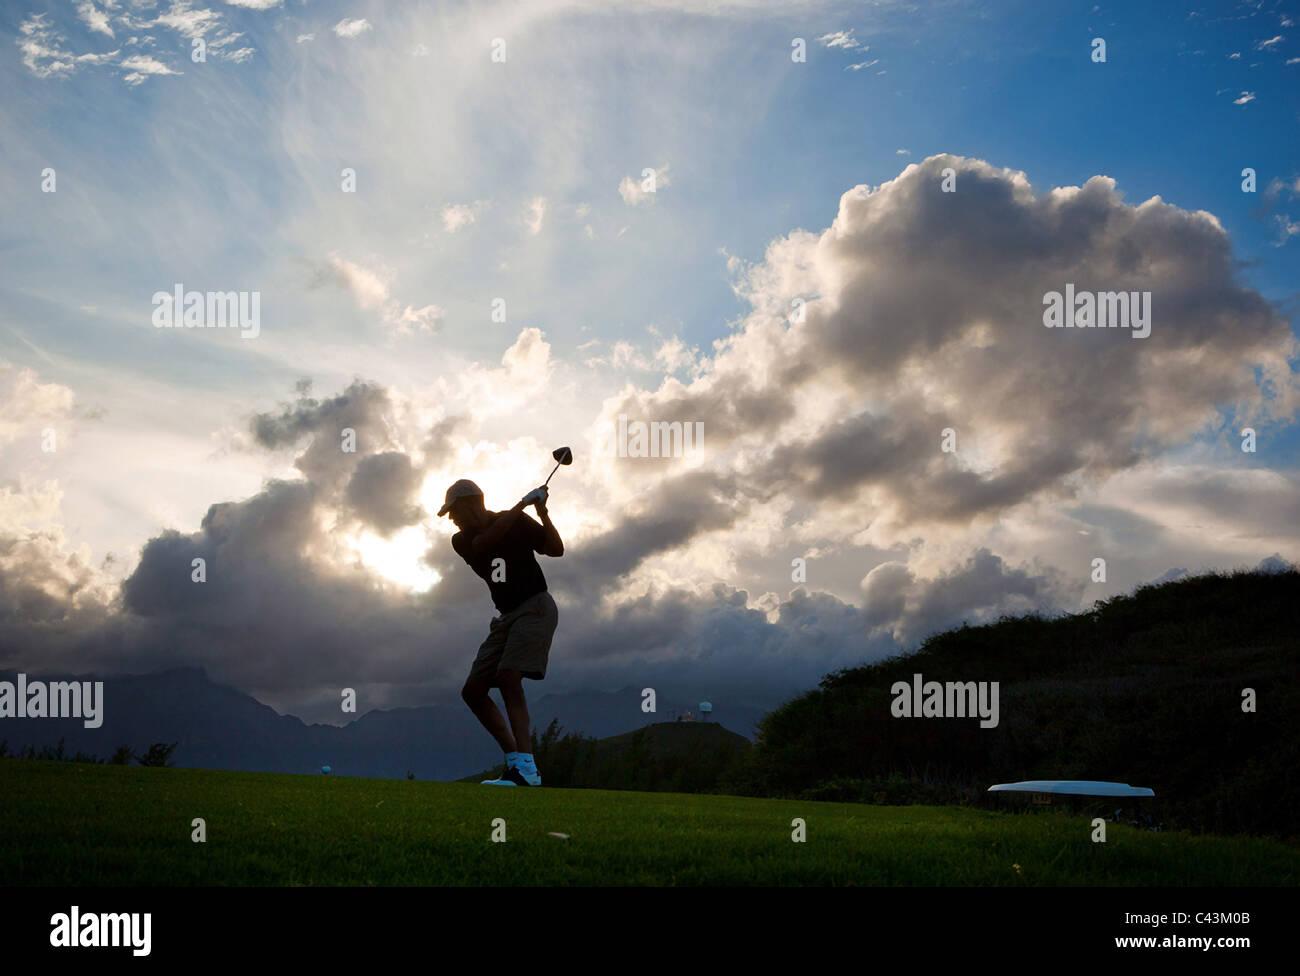 El presidente Barack Obama juega al golf en el campo de golf Marina de Kaneohe Klipper en Oahu, Hawaii, el 26 de Imagen De Stock